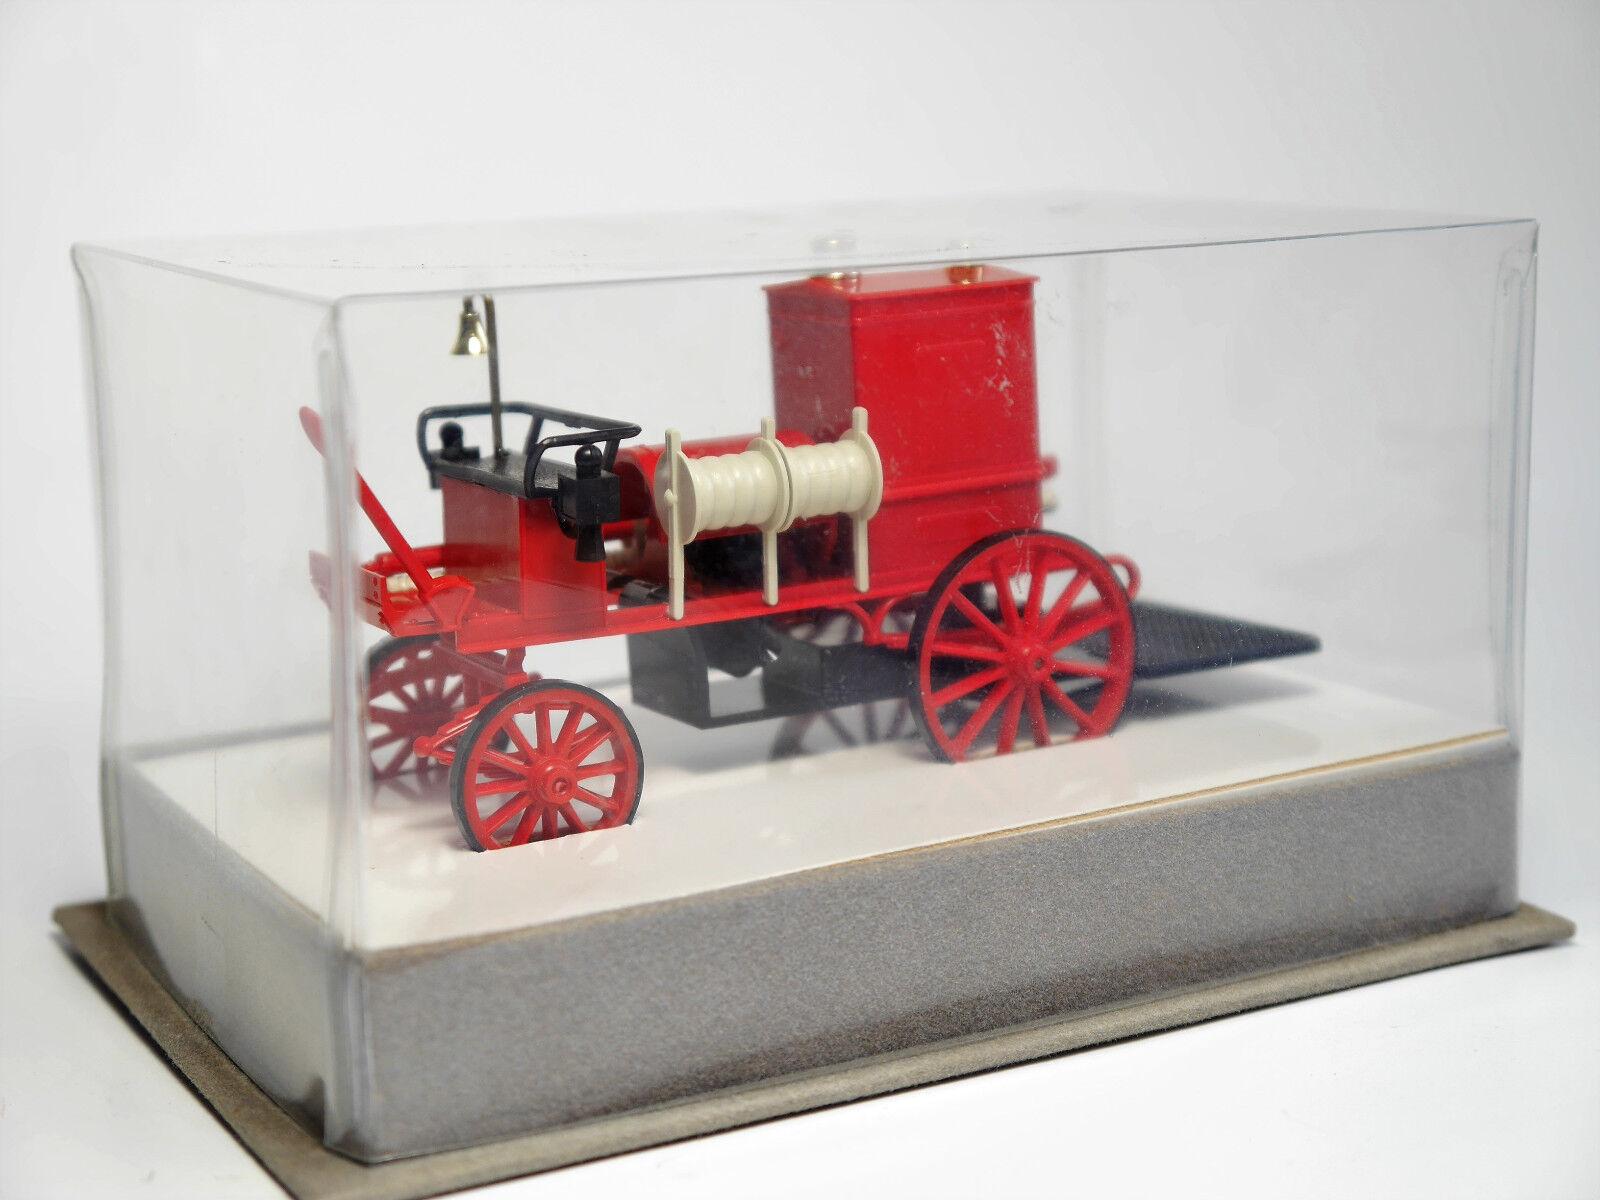 Feuerspritze mit Daimler Motor 1896 Feuerwehr fire engine, Cursor in 1 43 DEALER  | Exquisite (in) Verarbeitung